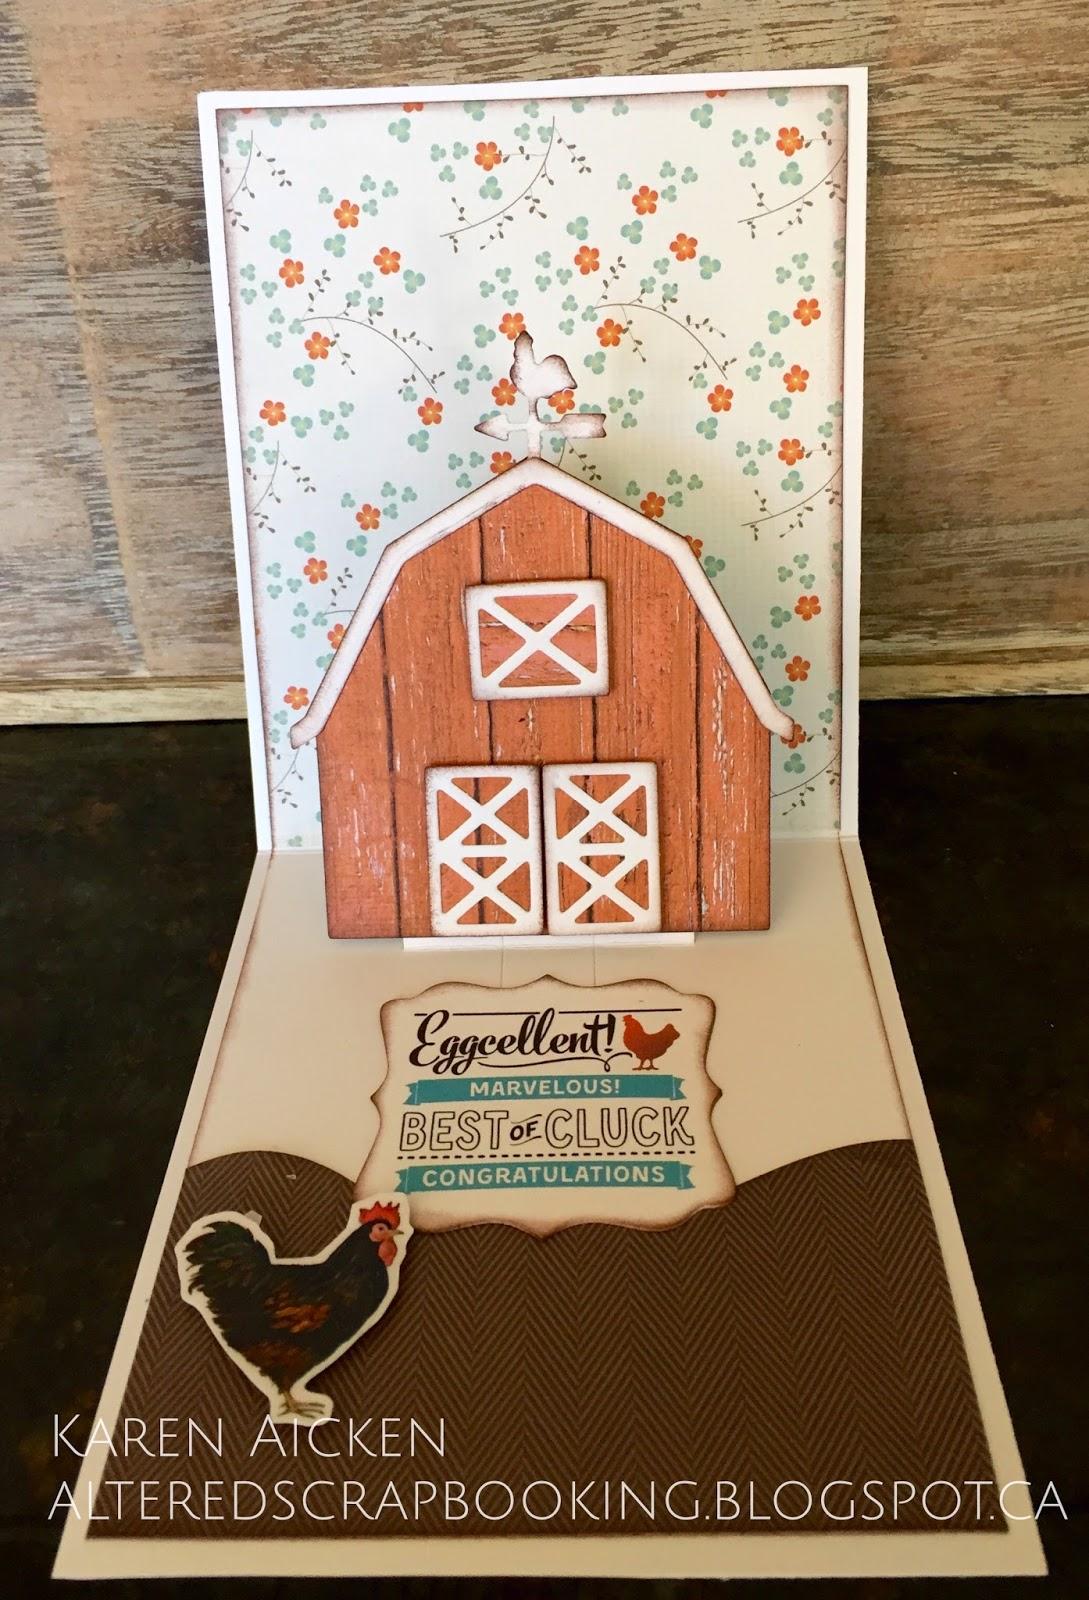 Altered Scrapbooking Eggcelent Barn Birthday Card